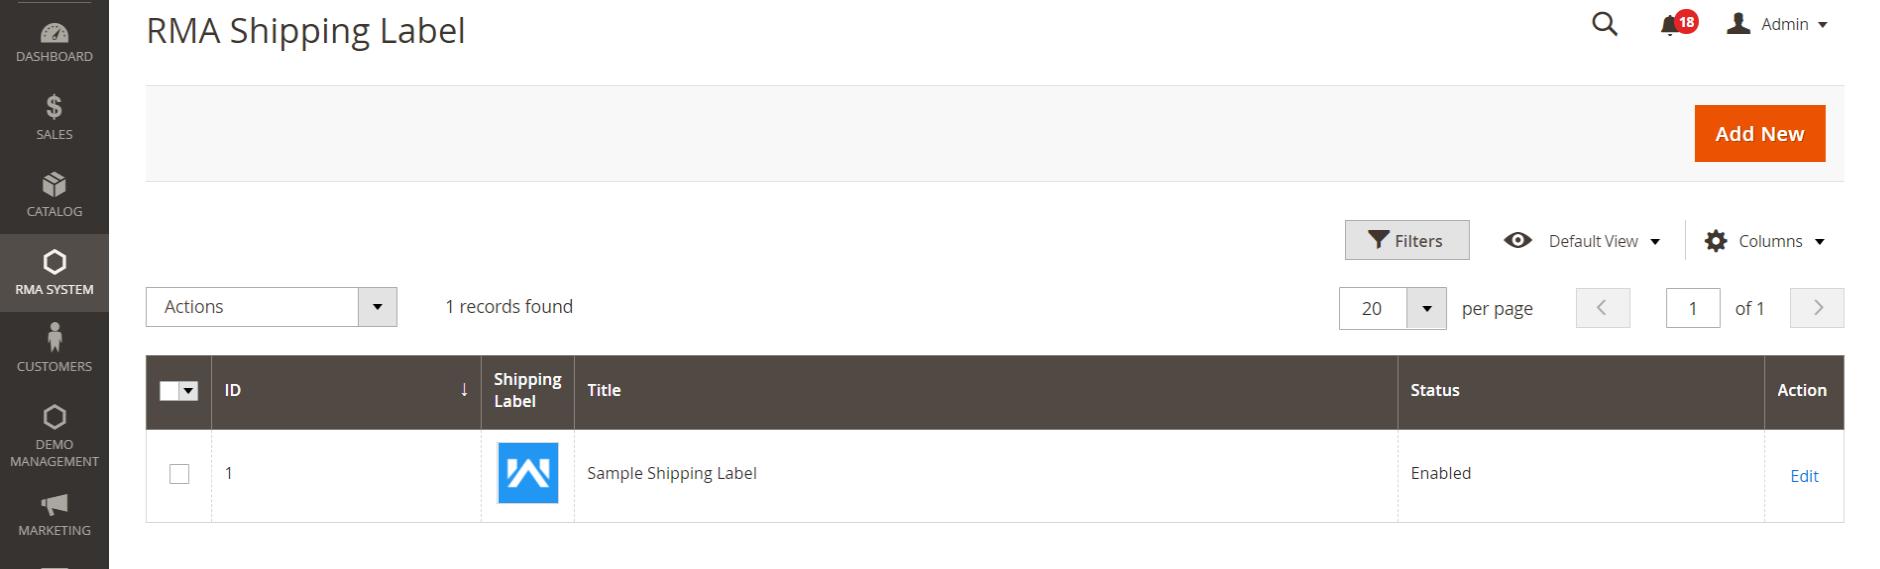 RMA-Shipping-Label-Menu-RMA-System-Magento-Admin-1